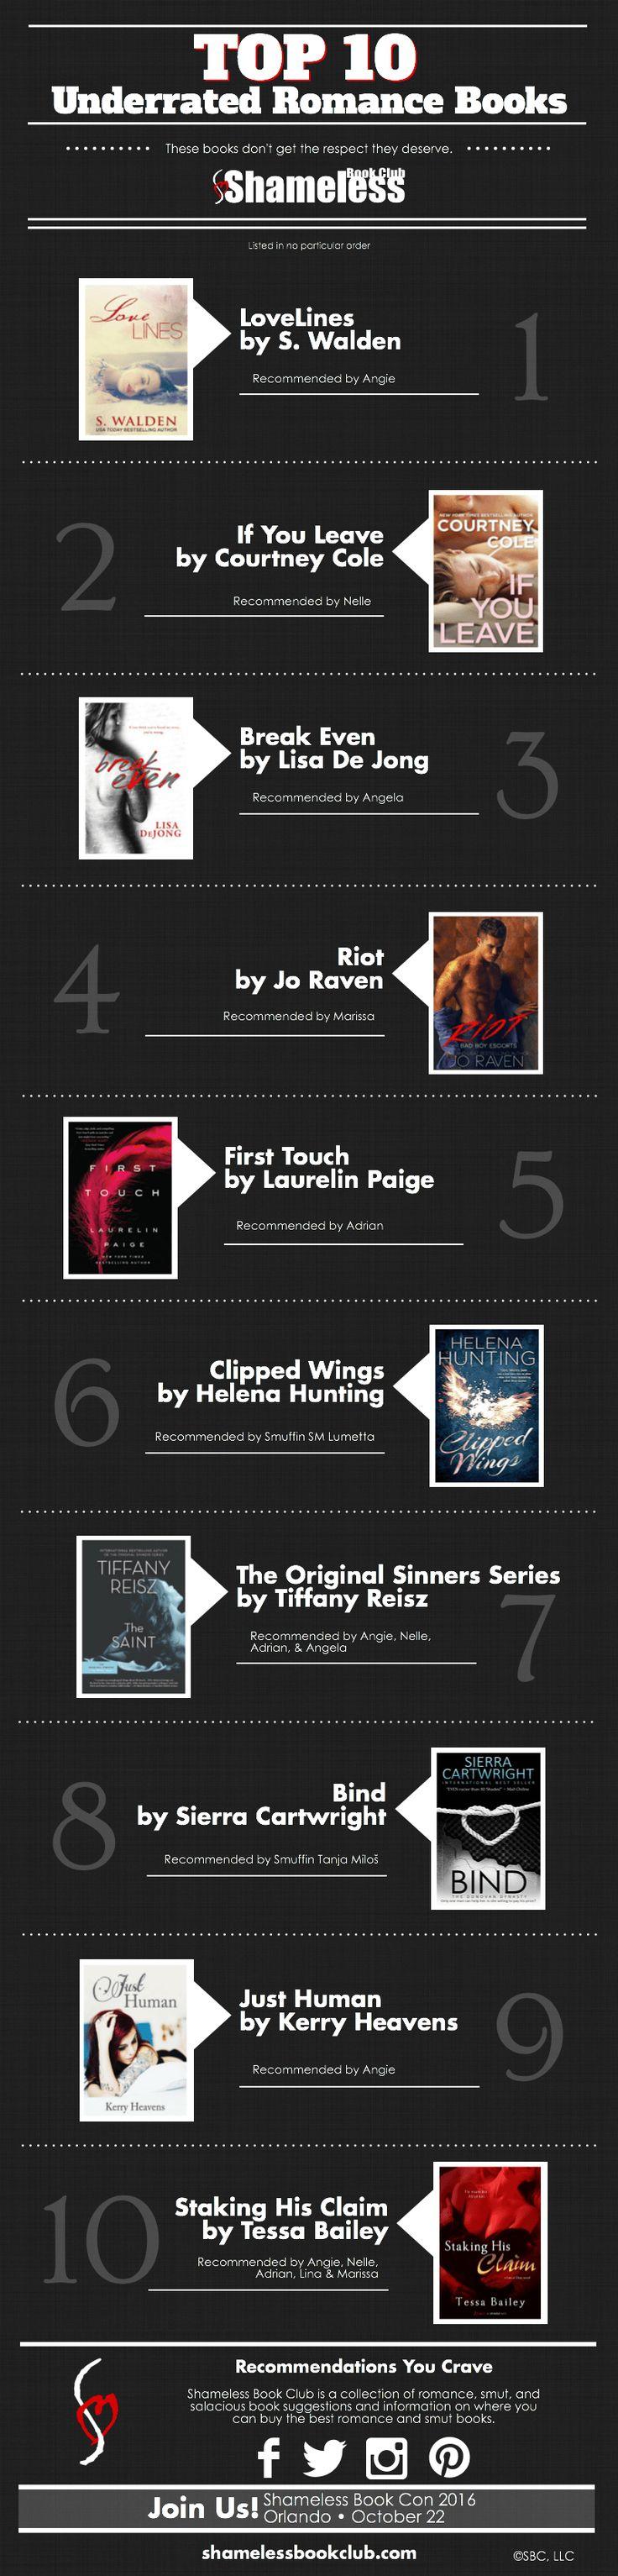 Top 10 Underrated Romance Books According to Shameless Book Club http://shamelessbookclub.com/book-news/top-10-underrated-romance-books/